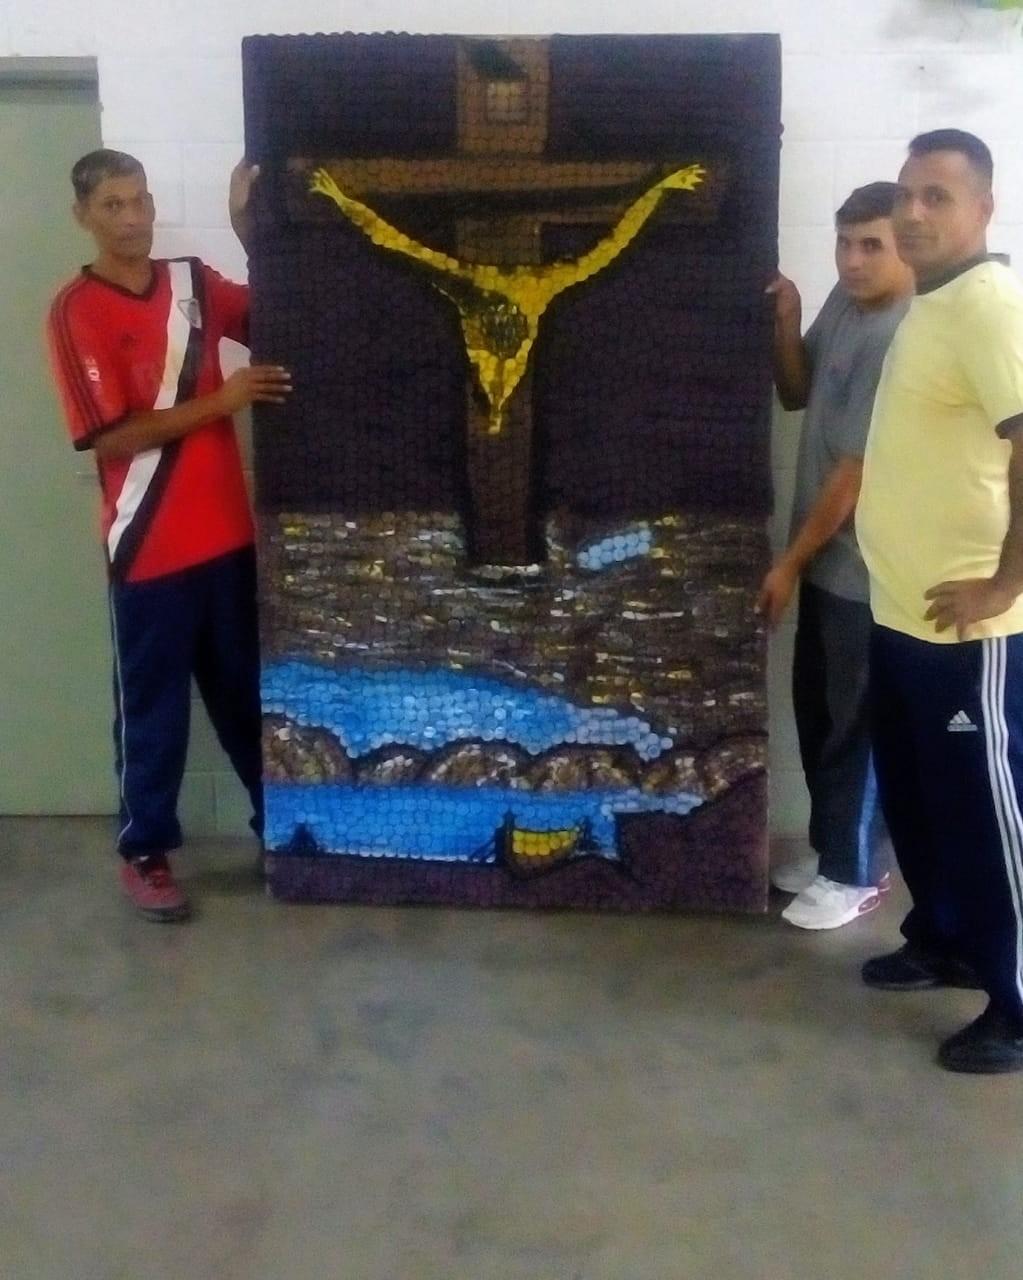 Internos de la Unidad 38 taparon al Cristo de Dalí